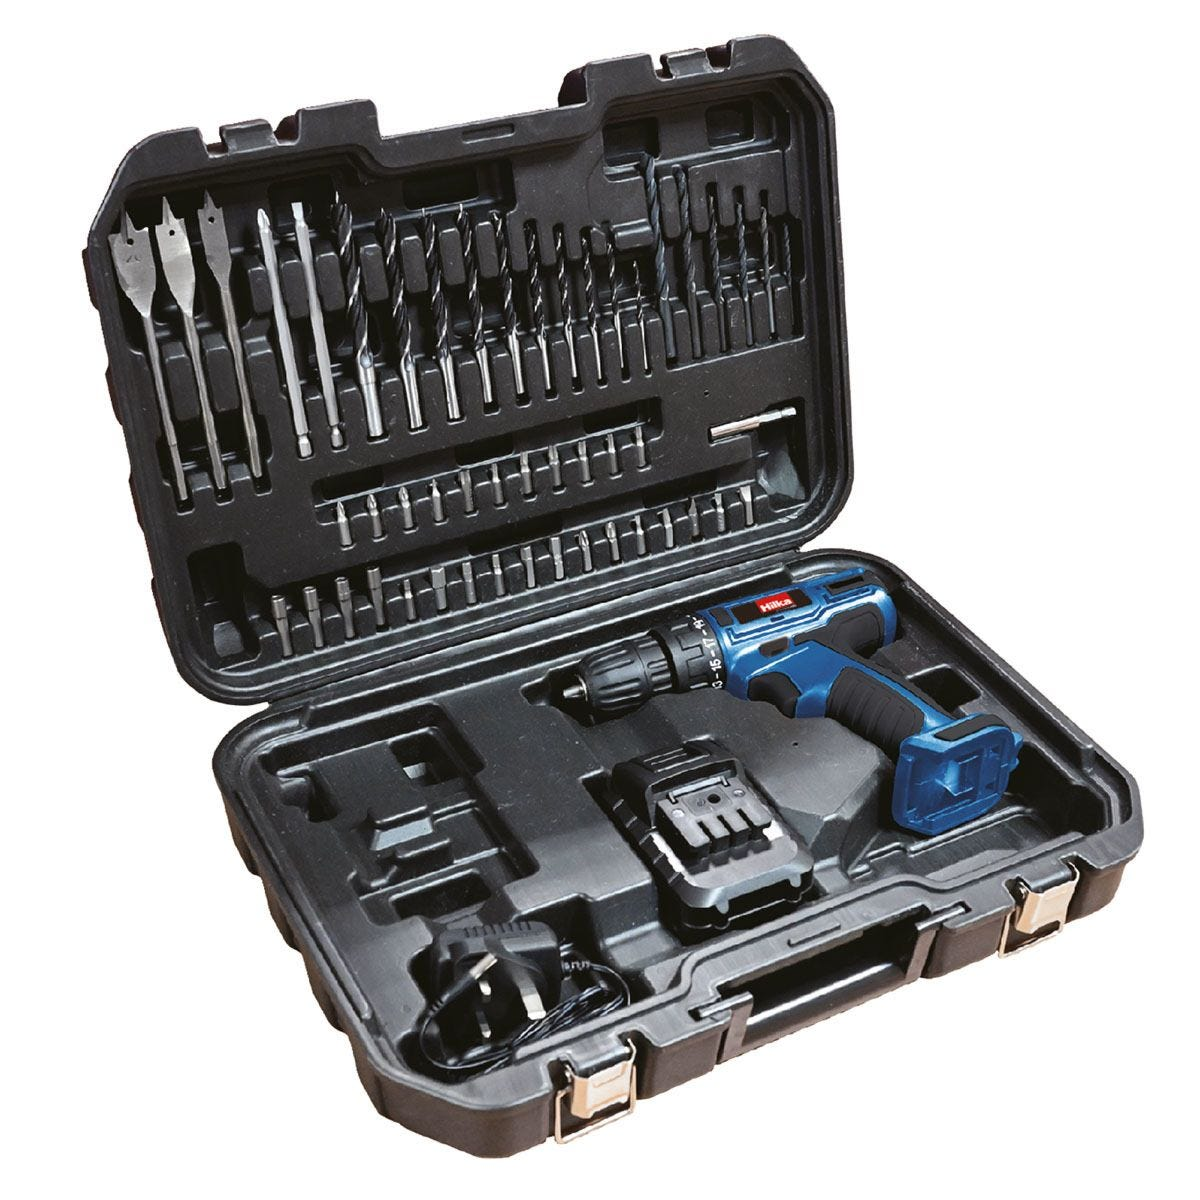 Hilka 18V Li-ion Cordless Drill/Driver with 50 Accessories